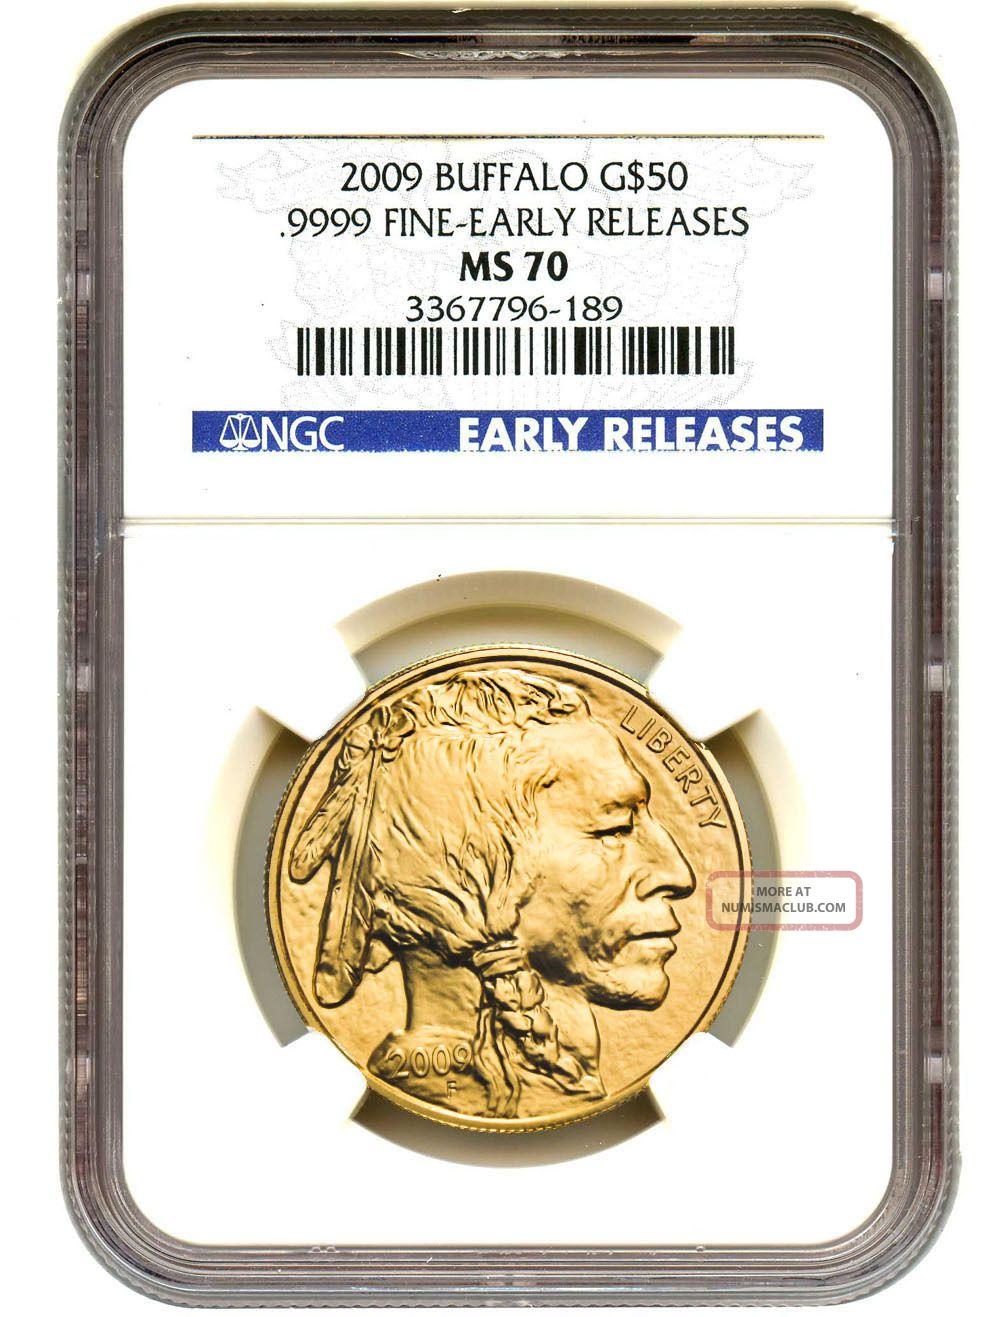 2009 American Buffalo $50 Ngc Ms70 (early Releases) Buffalo.  999 Gold Gold photo